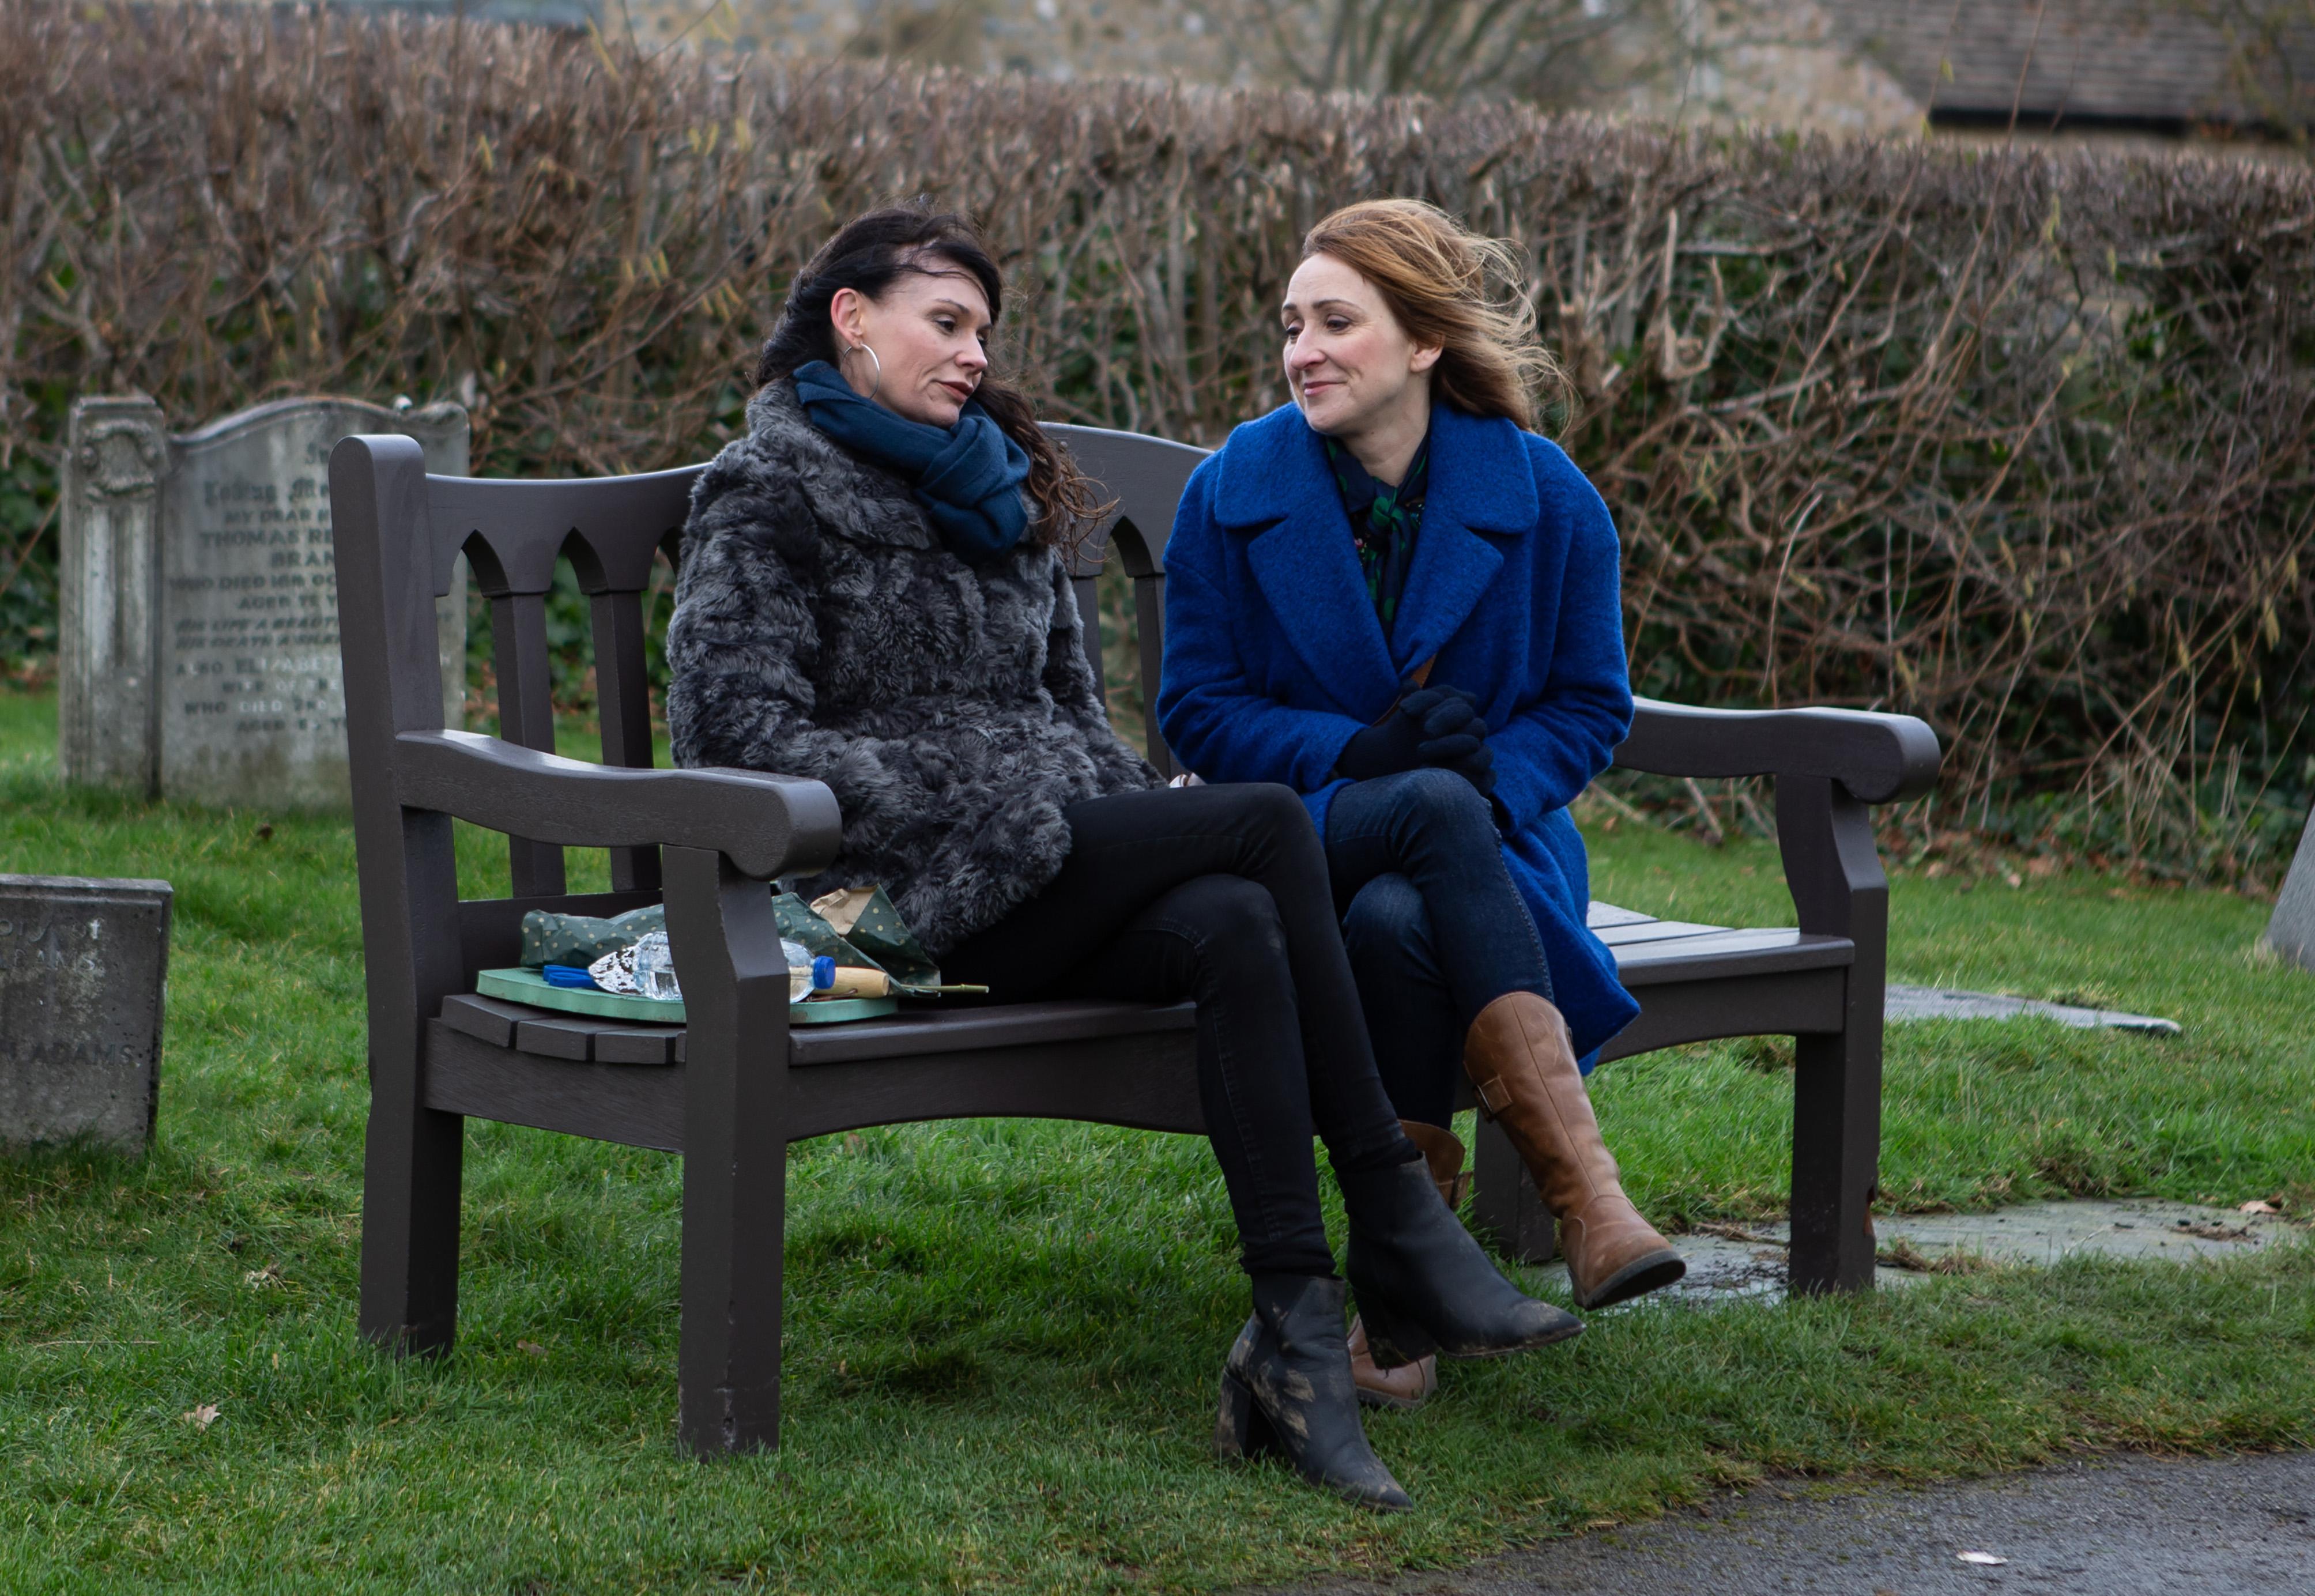 Emmerdale's all female episode isn't anti-men, it's a well-deserved celebration of women